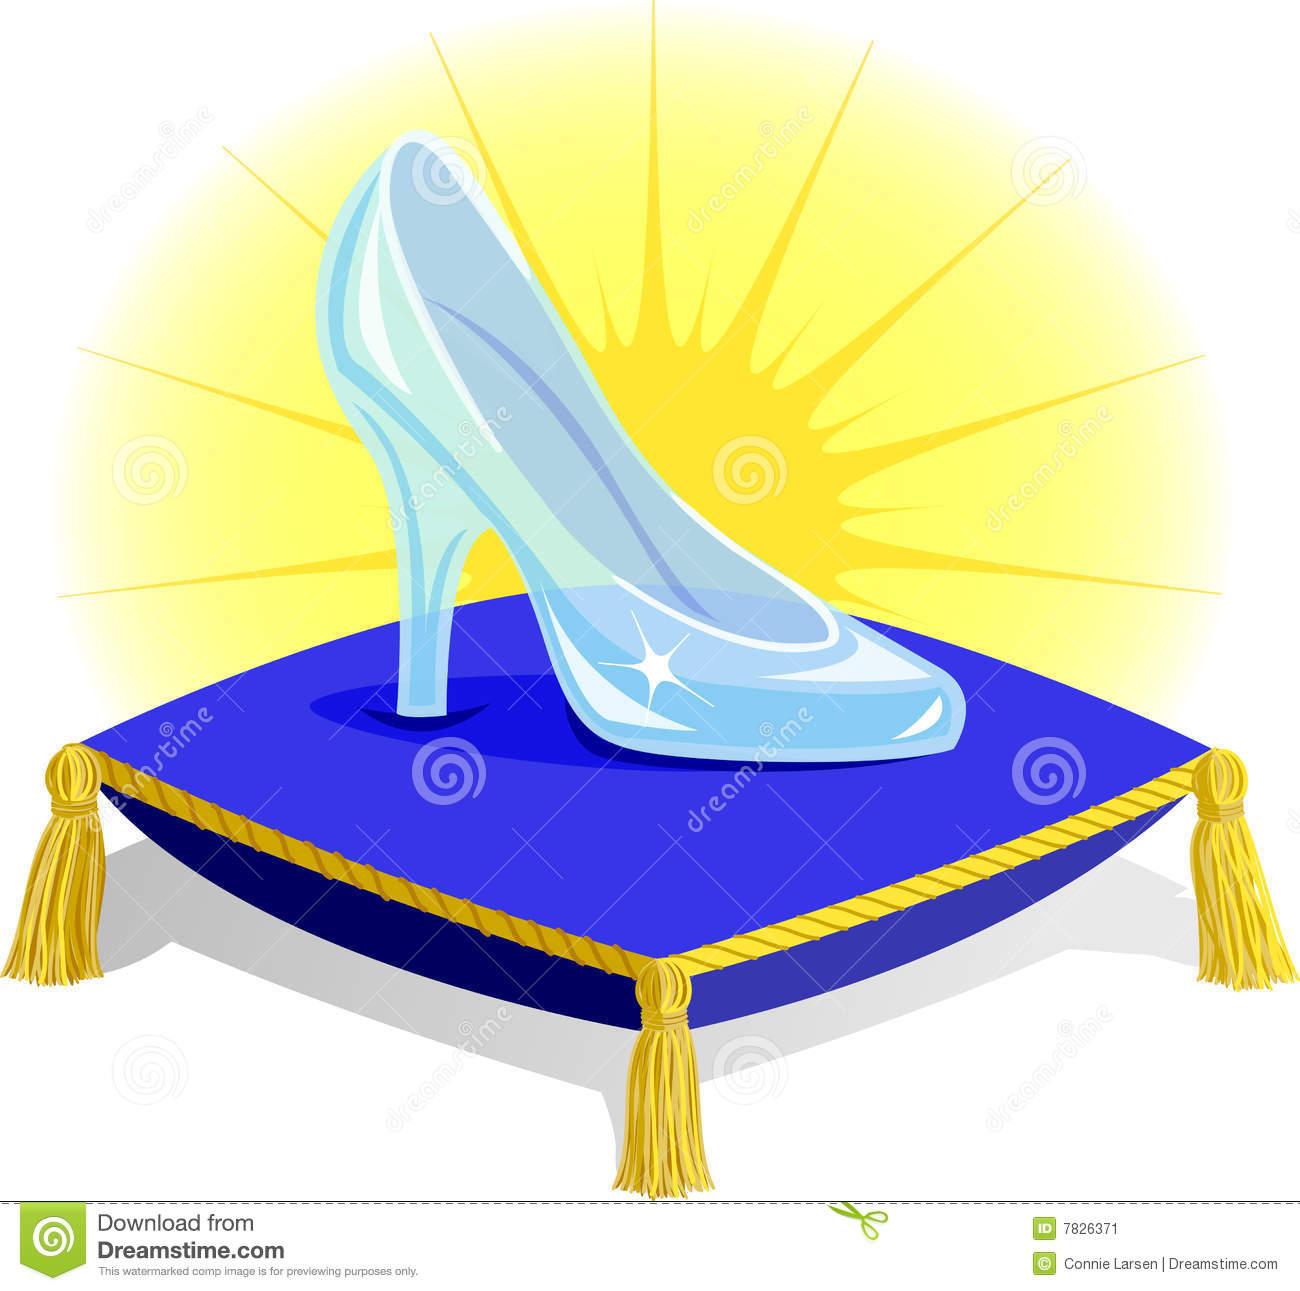 cinderella's glass slipper.